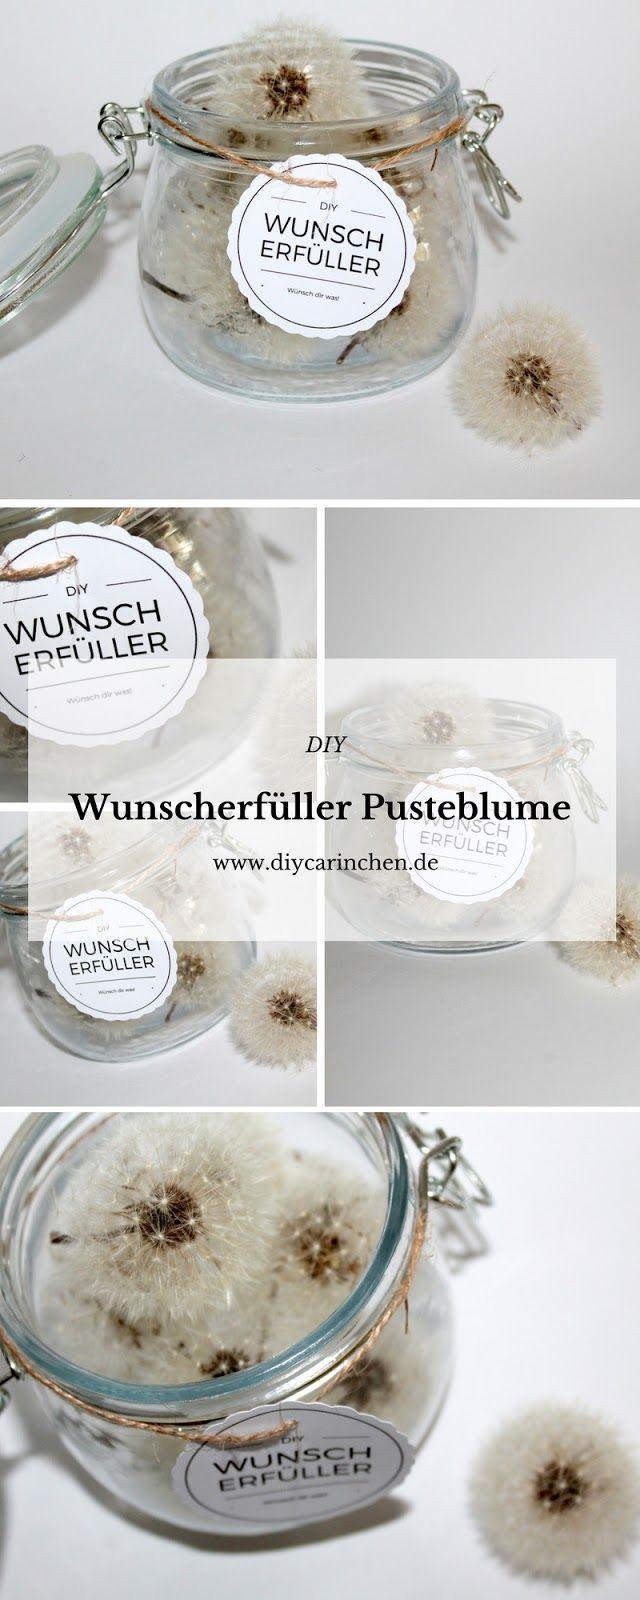 diy wunscherf ller pusteblume free printable diy geschenke geschenkideen pinterest. Black Bedroom Furniture Sets. Home Design Ideas